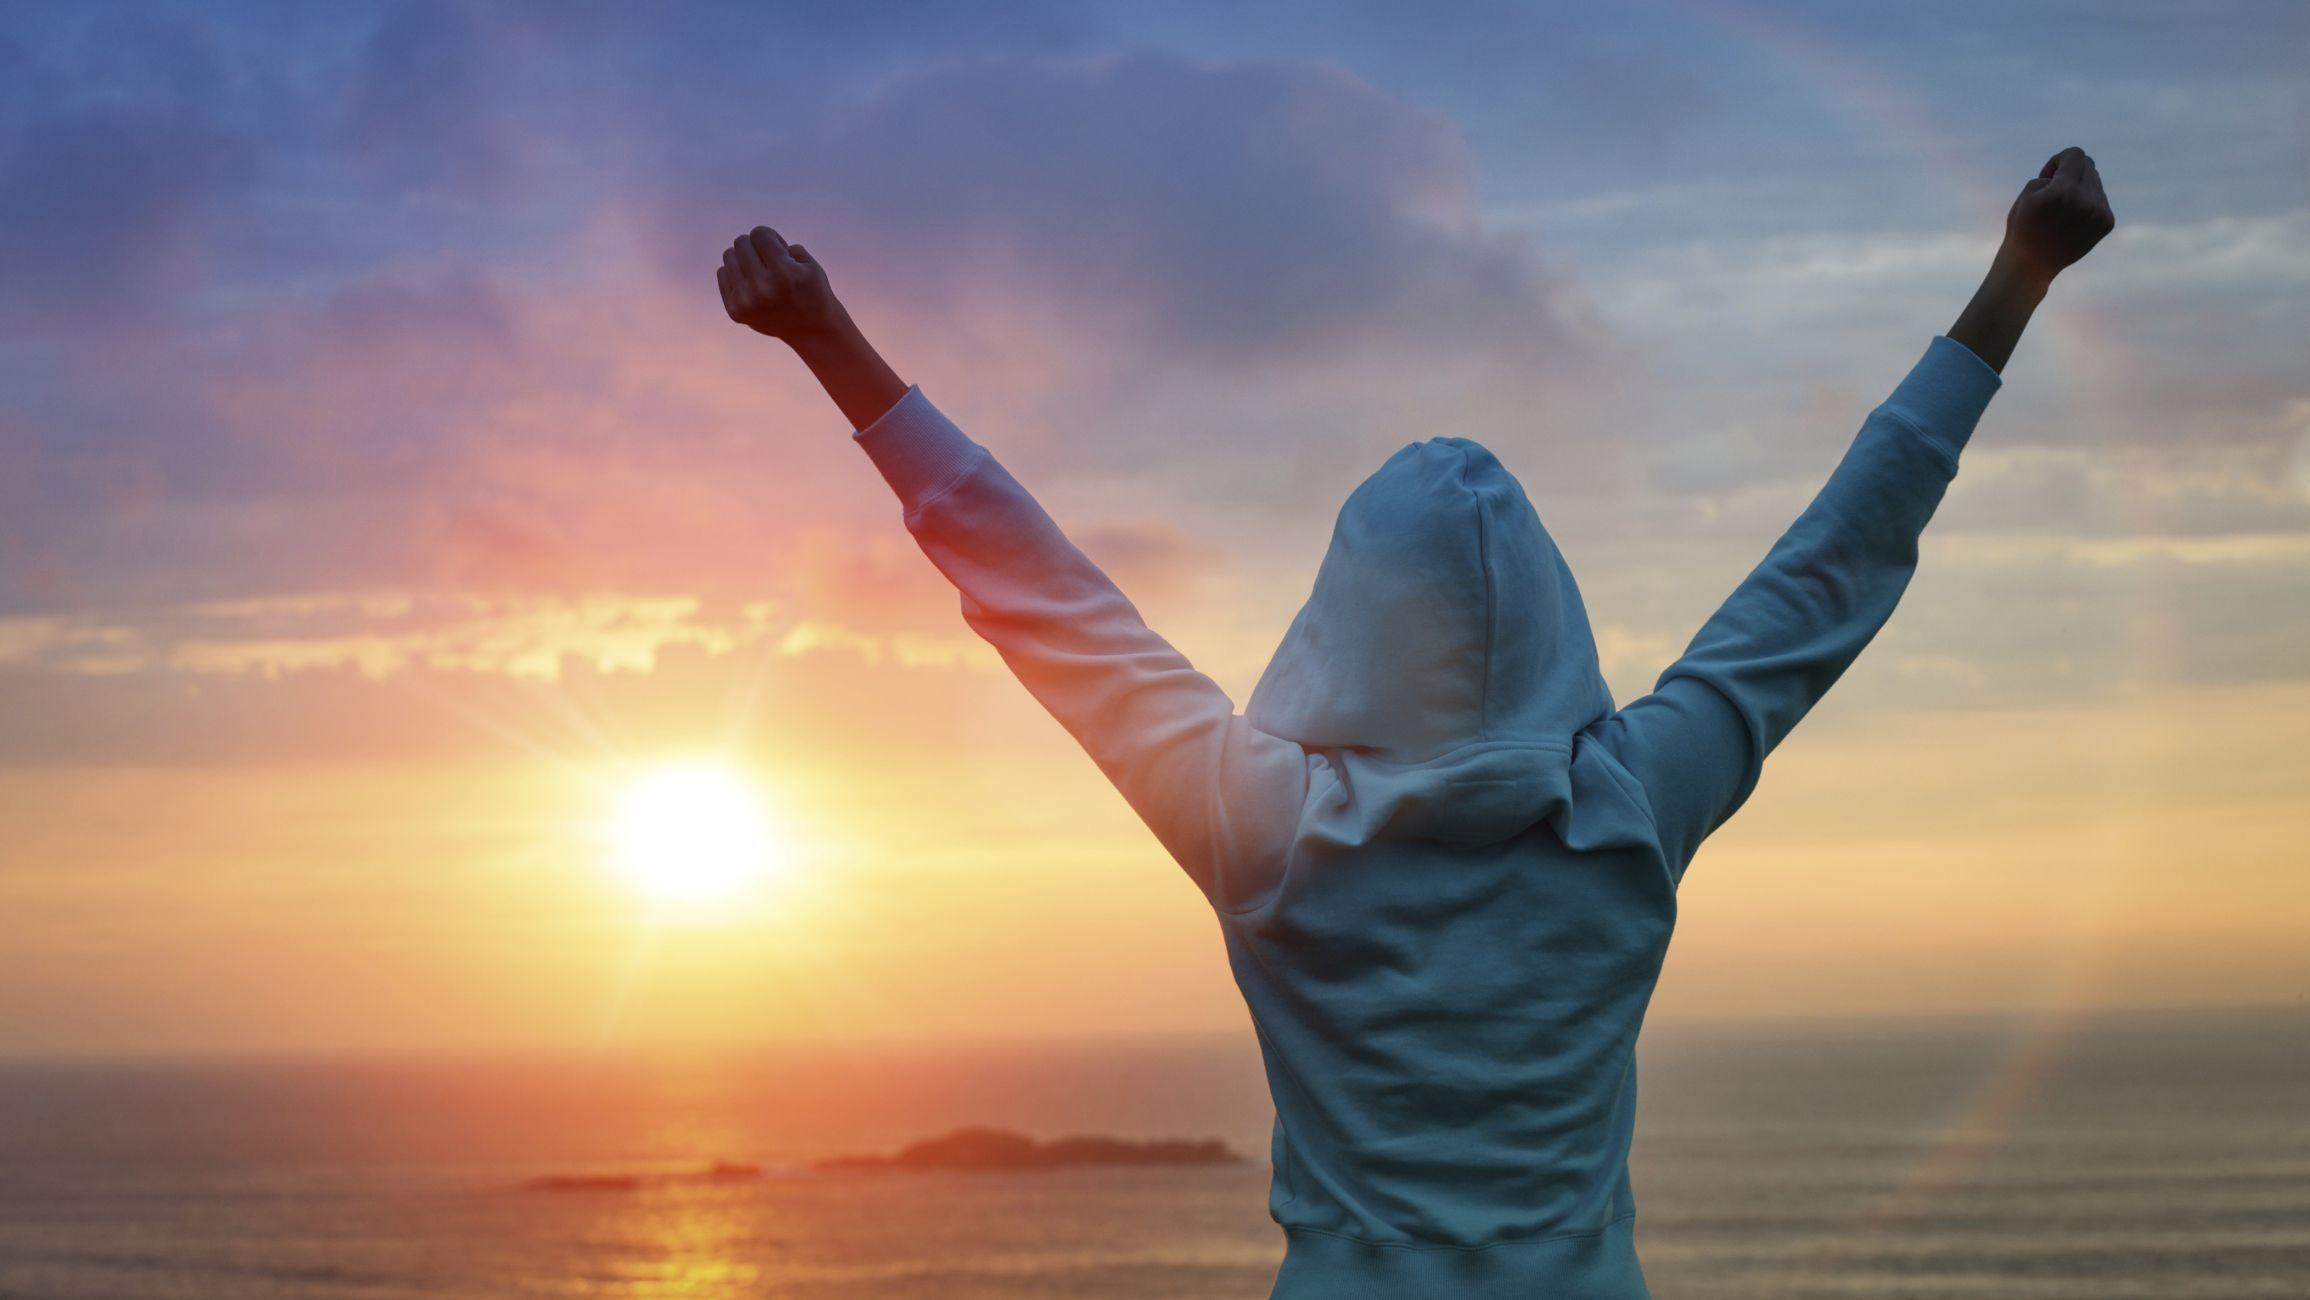 The Importance of Having Good Self-Esteem